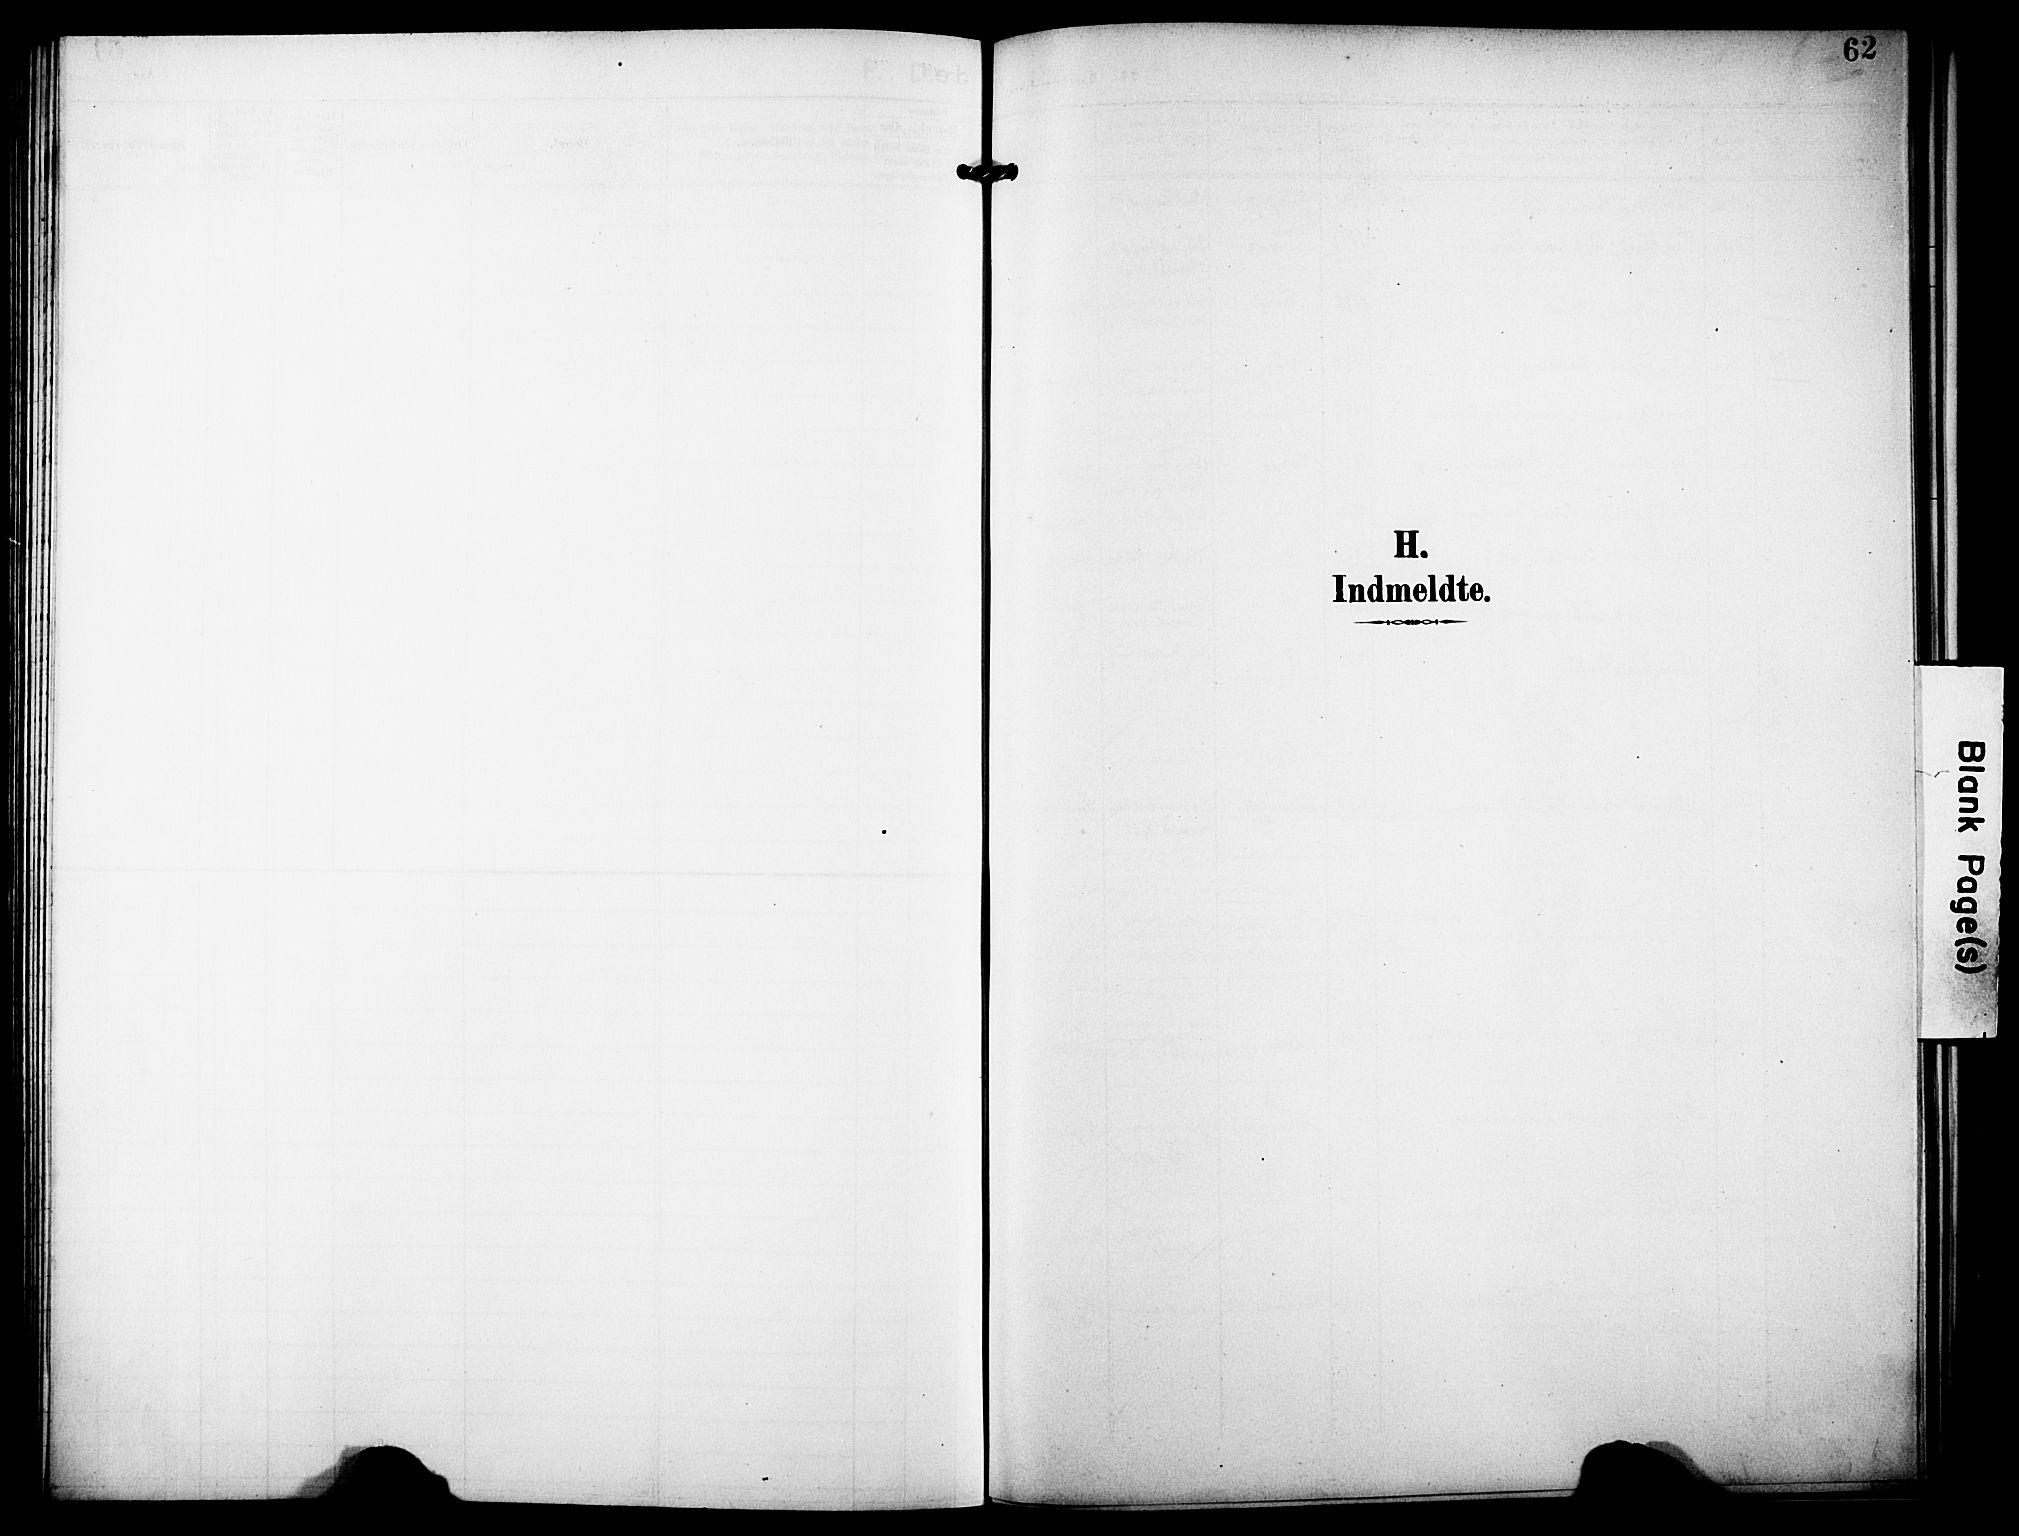 SATØ, Tromsø sokneprestkontor/stiftsprosti/domprosti, G/Ge/L0068: Dissenterprotokoll nr. 68, 1907-1917, s. 62